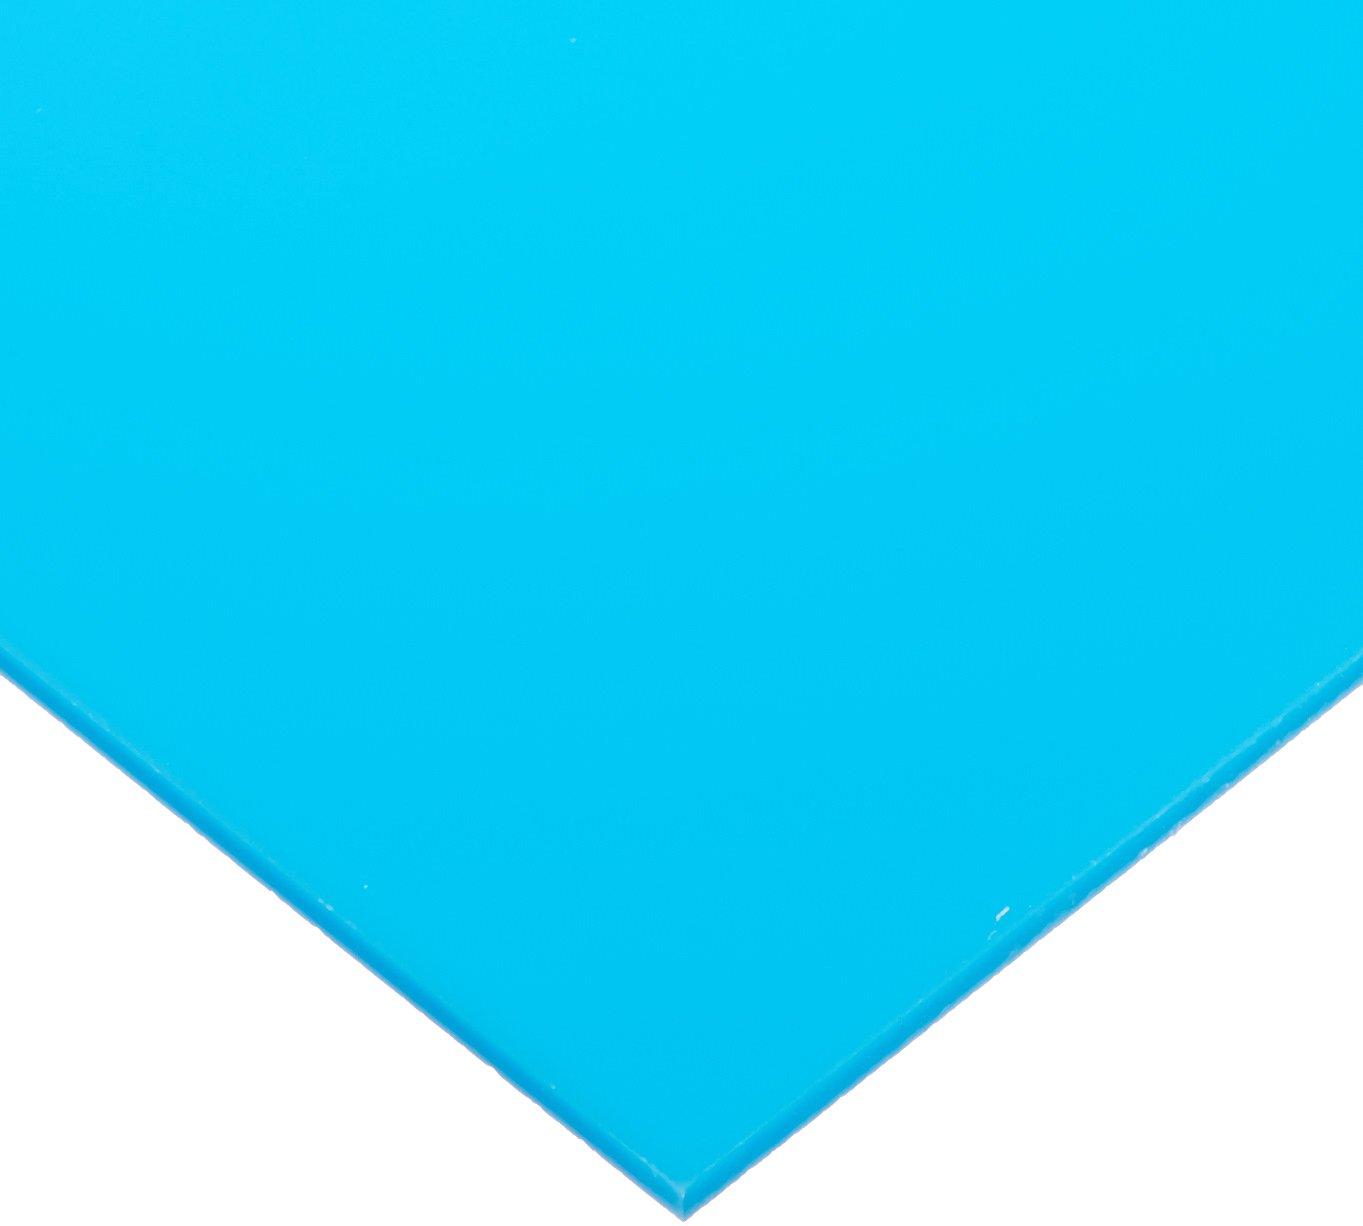 Cast Acrylic Sheet, Translucent Light Blue, 24